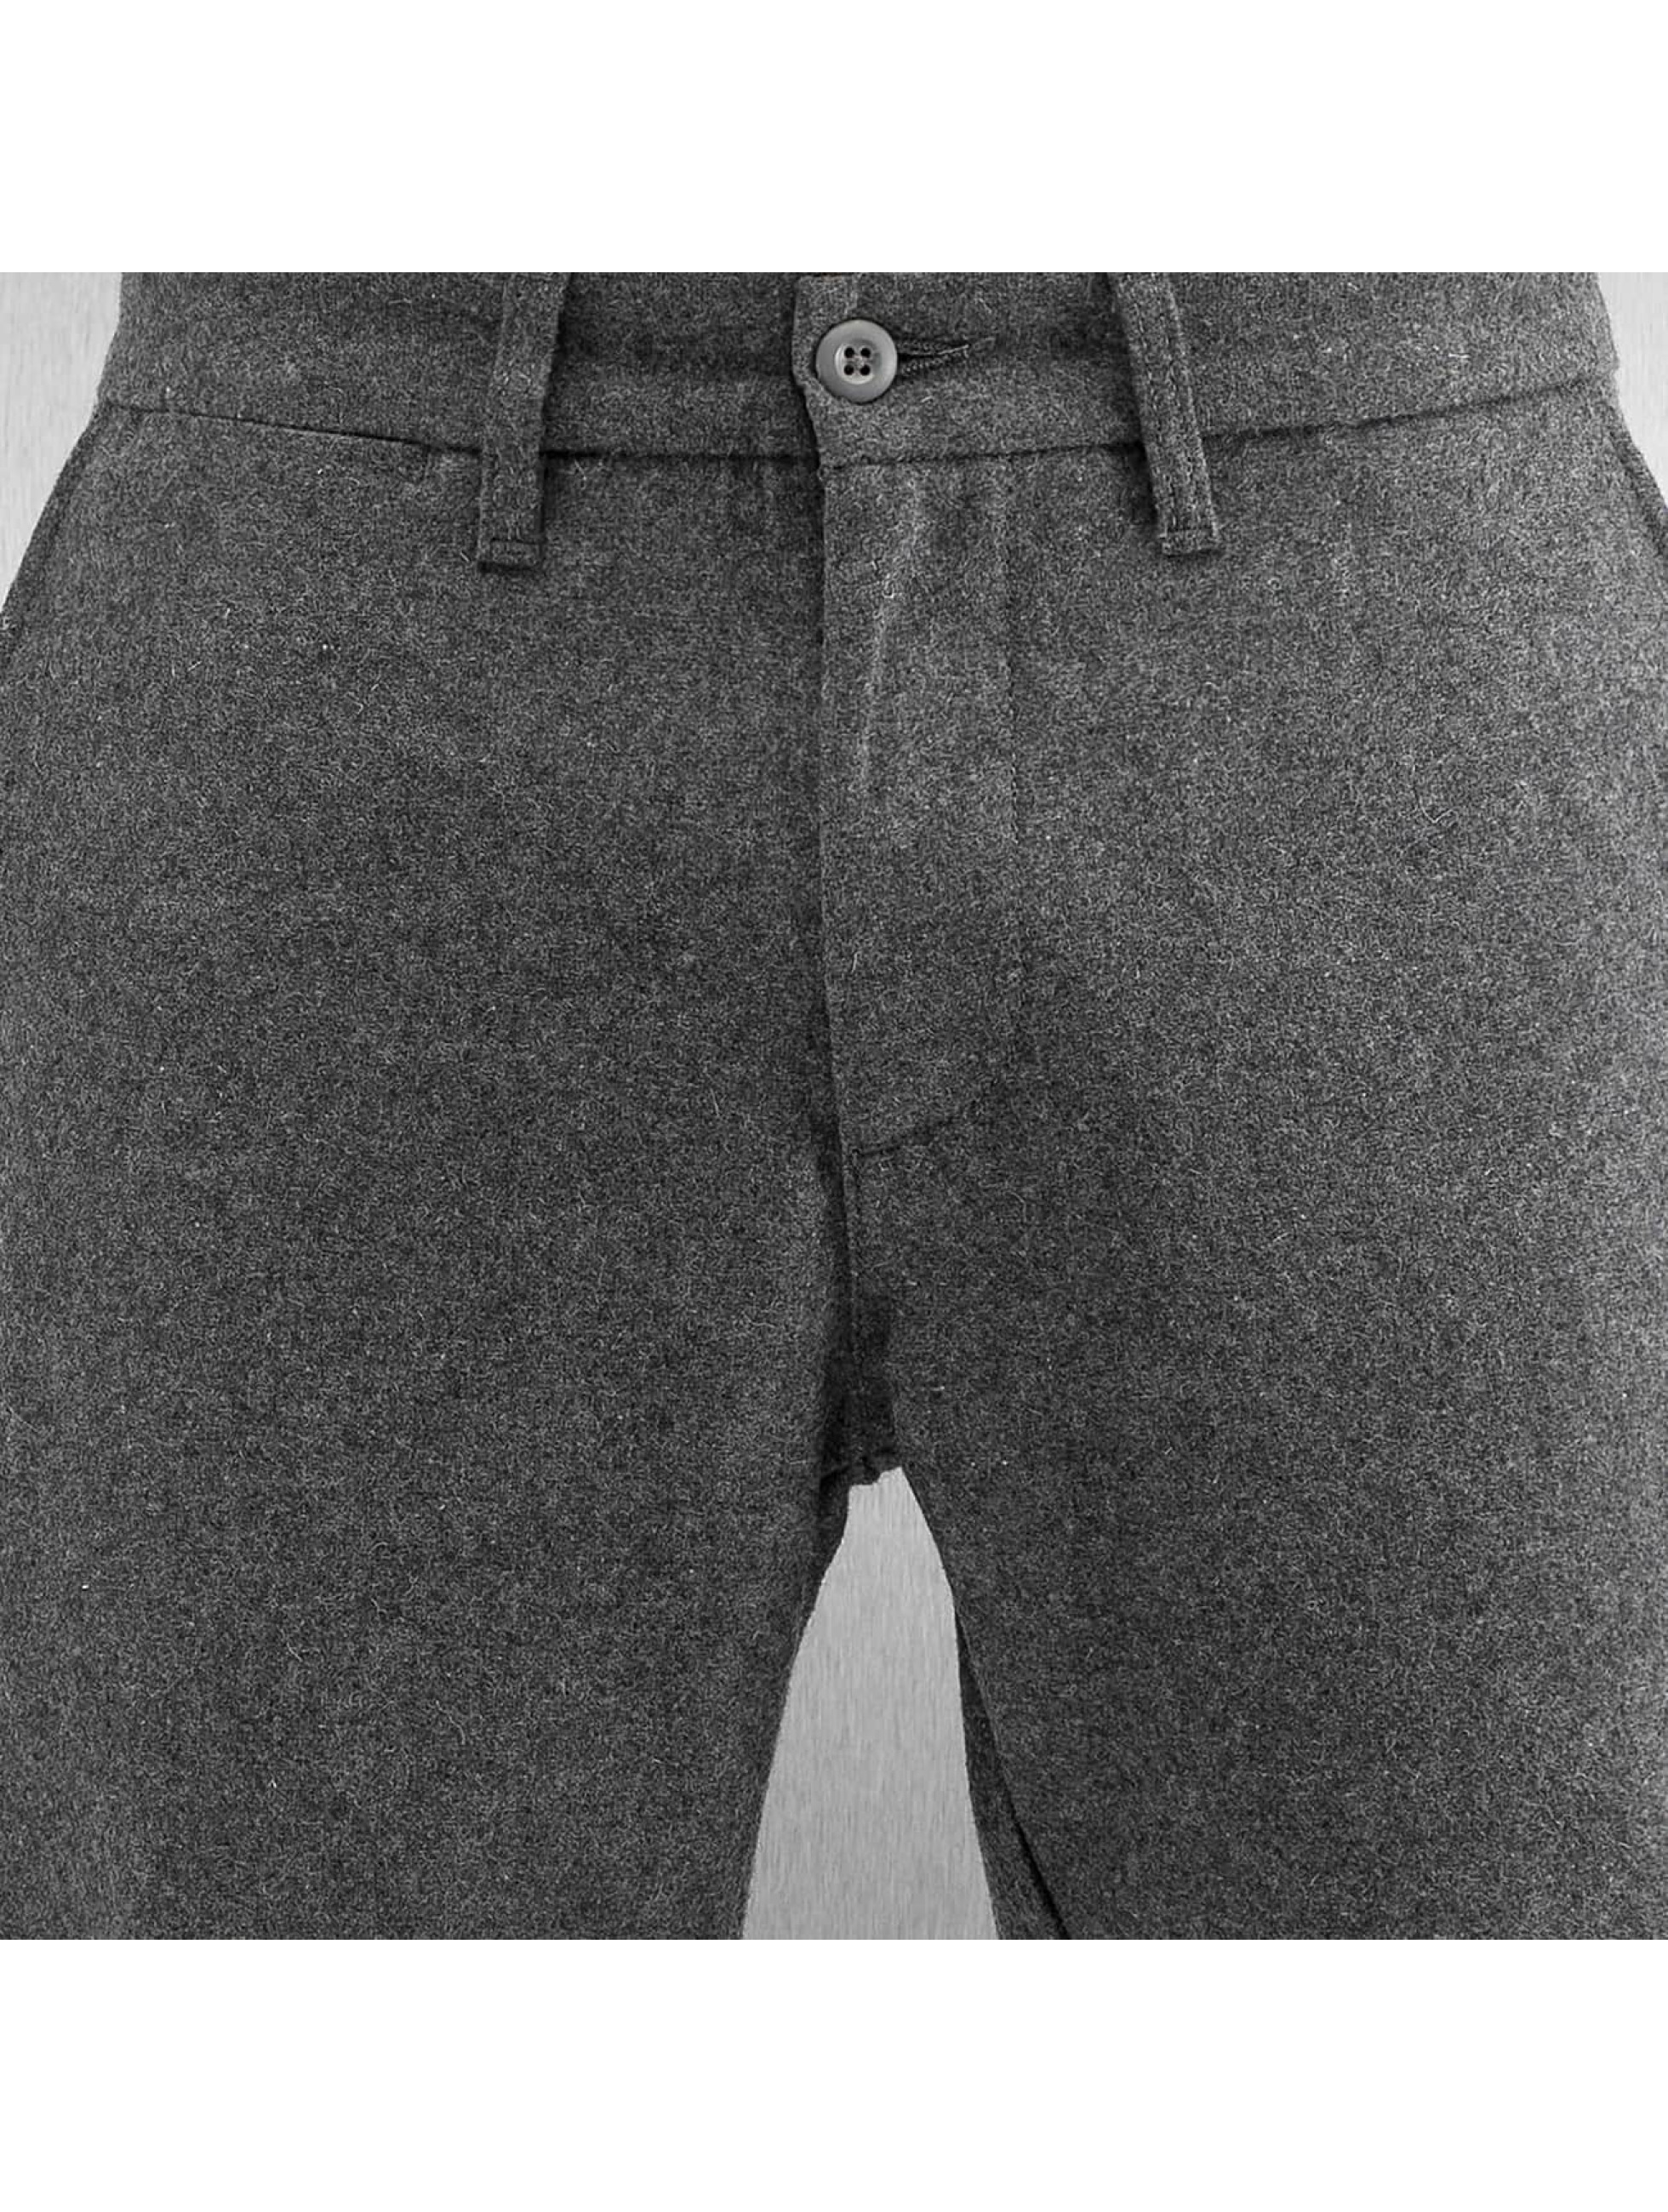 Carhartt WIP Chino Southbury Johnson grey